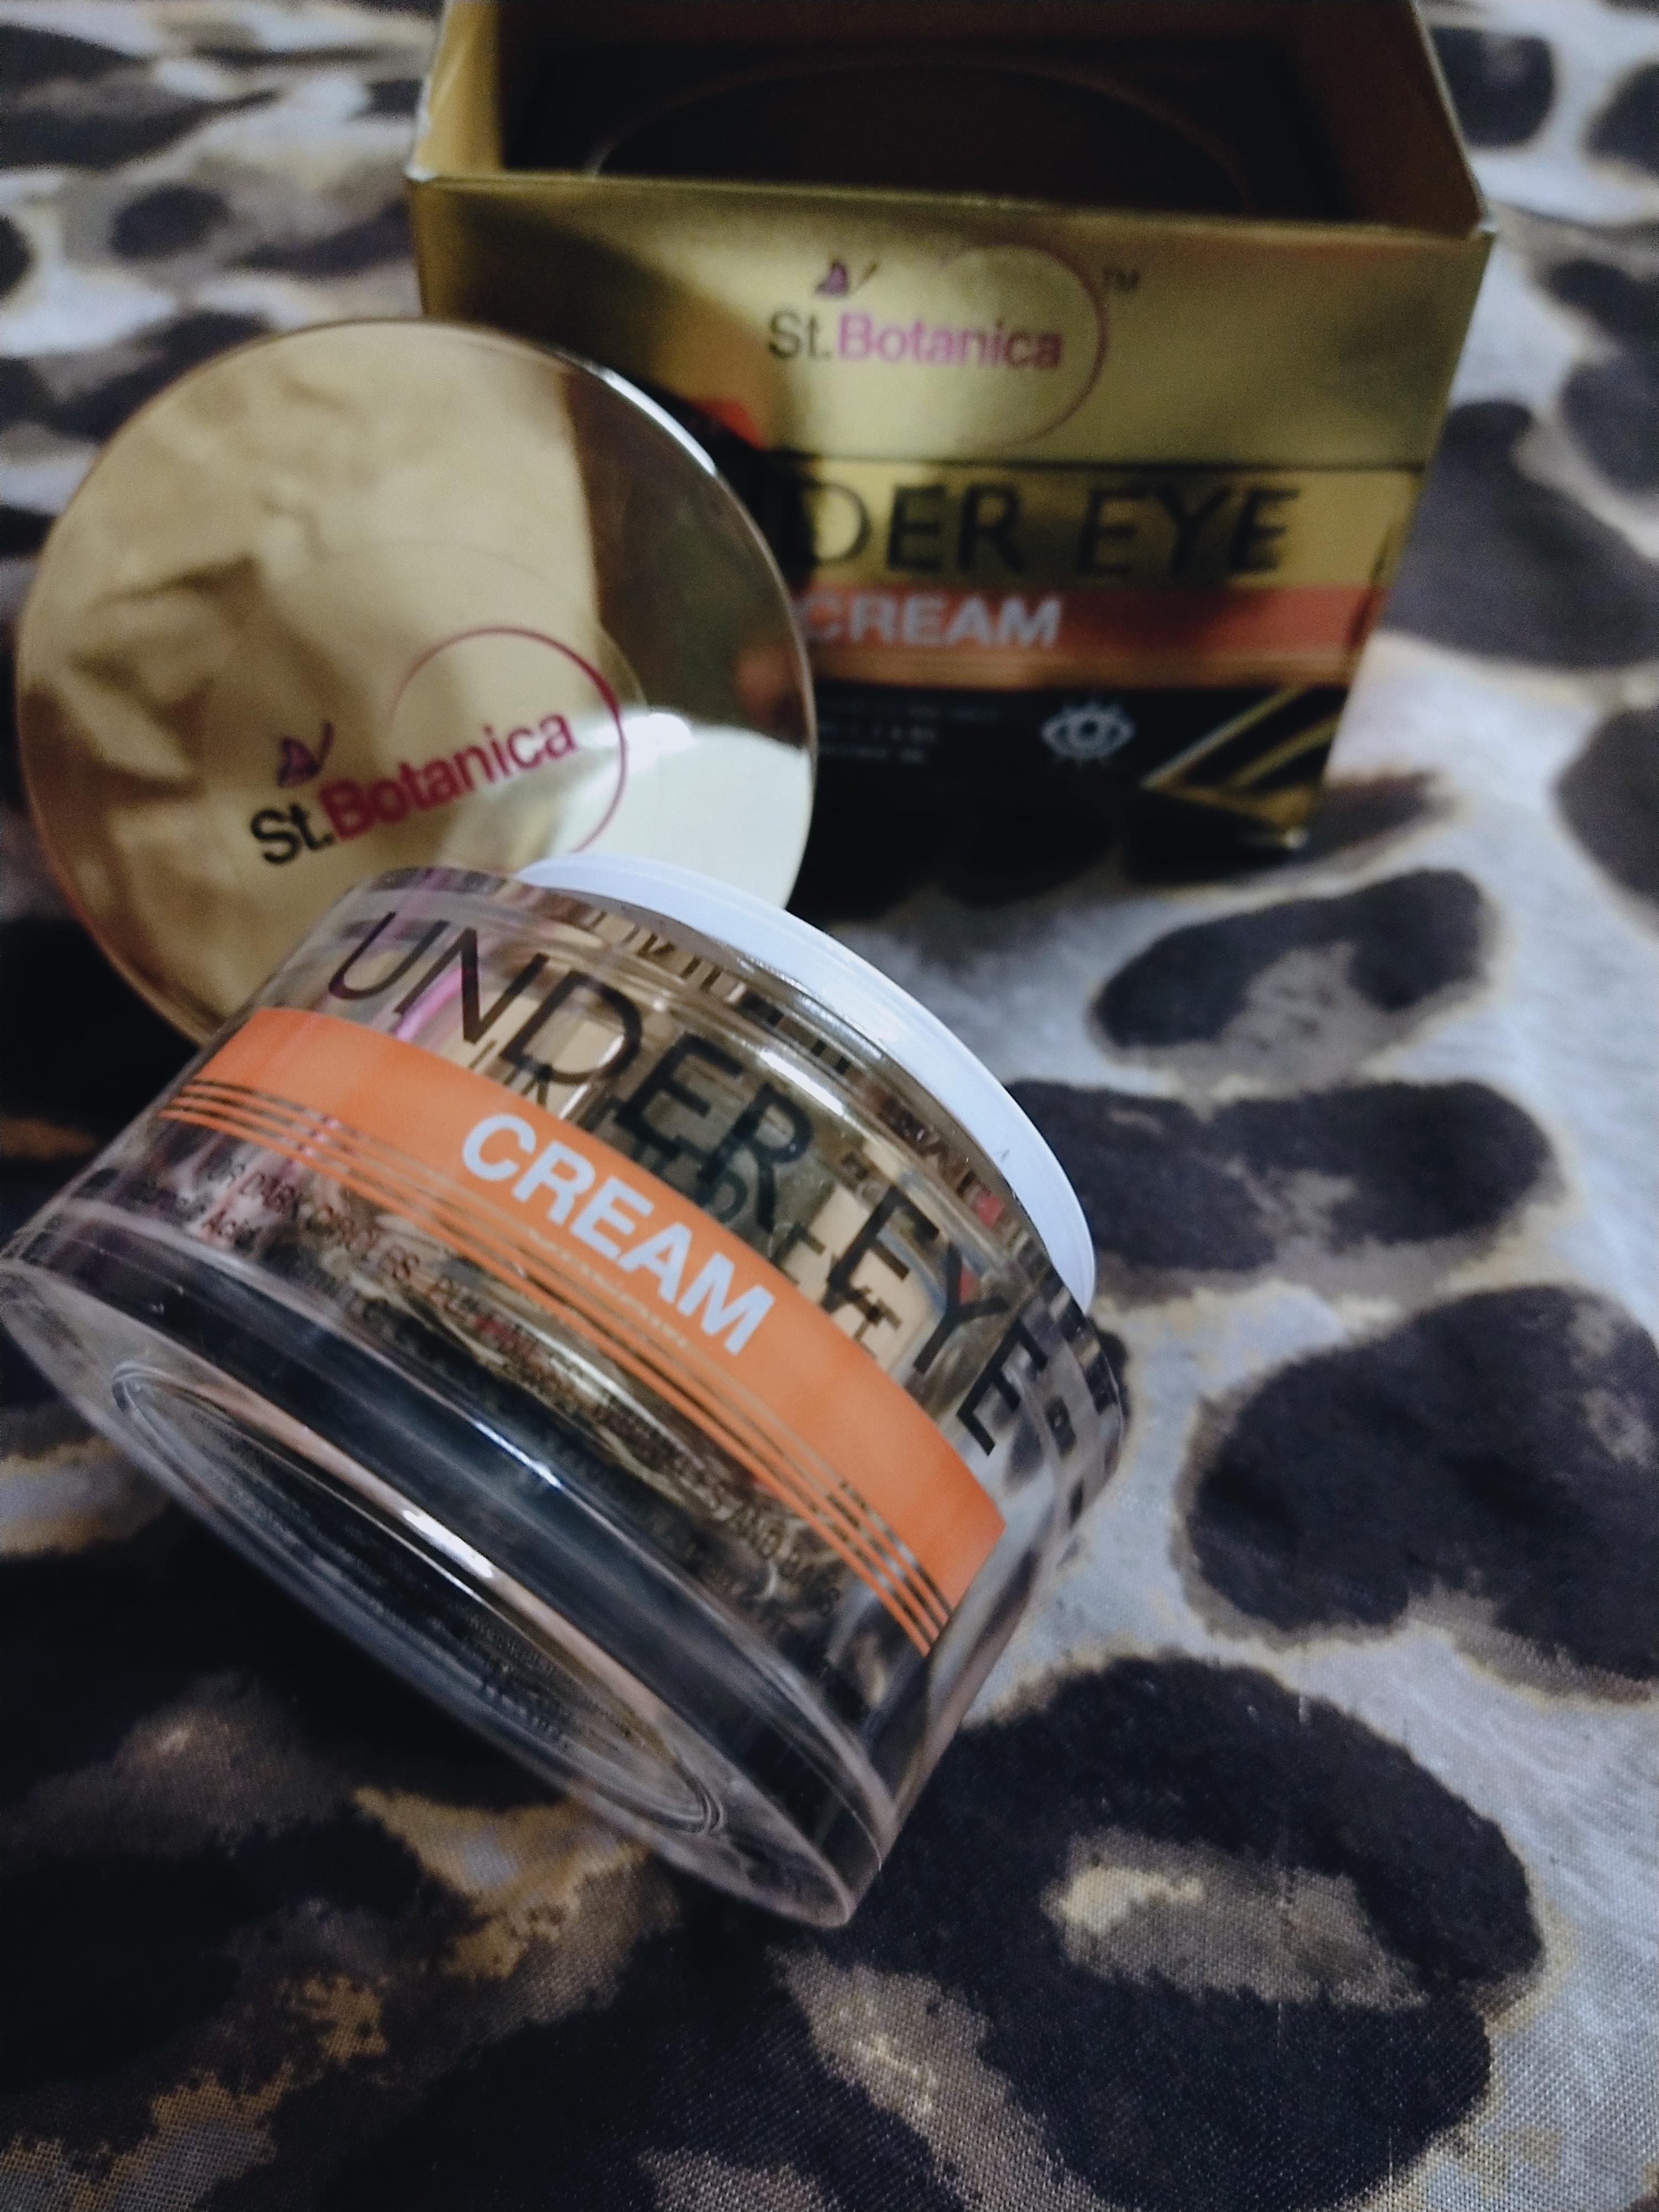 StBotanica Pure Radiance Under Eye Cream-Best product for dark circles-By tajmim_rahmani